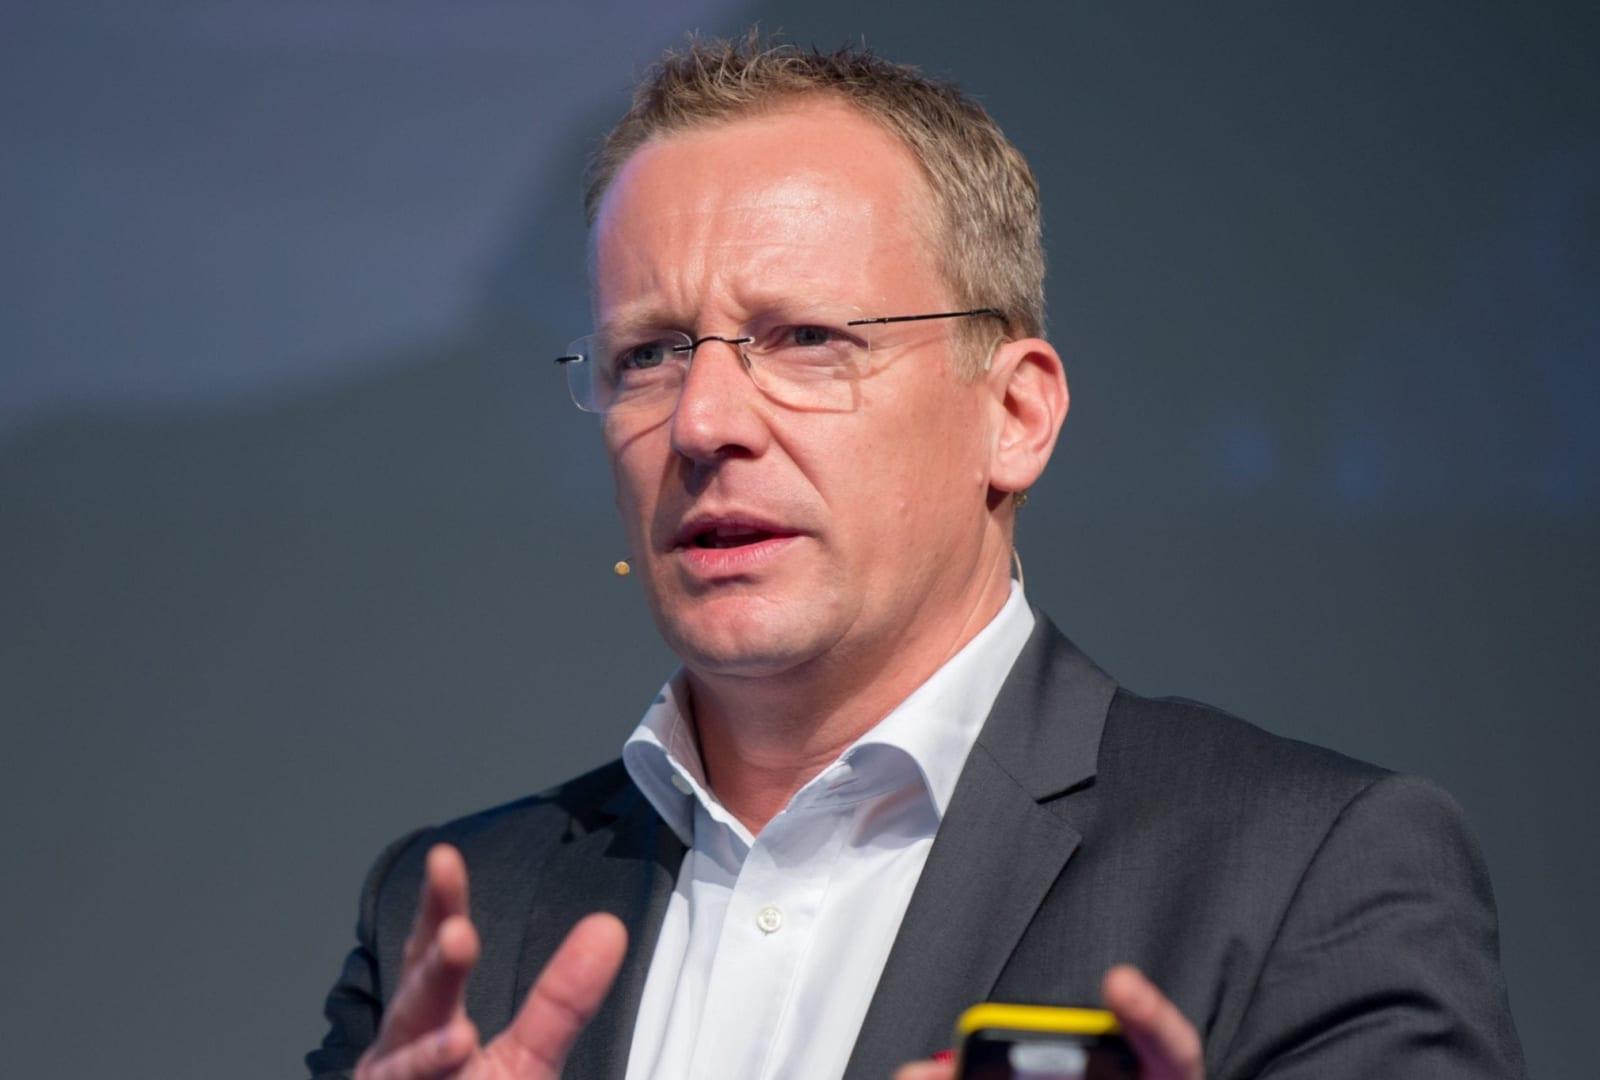 Simon Lehmann speaking at a major event